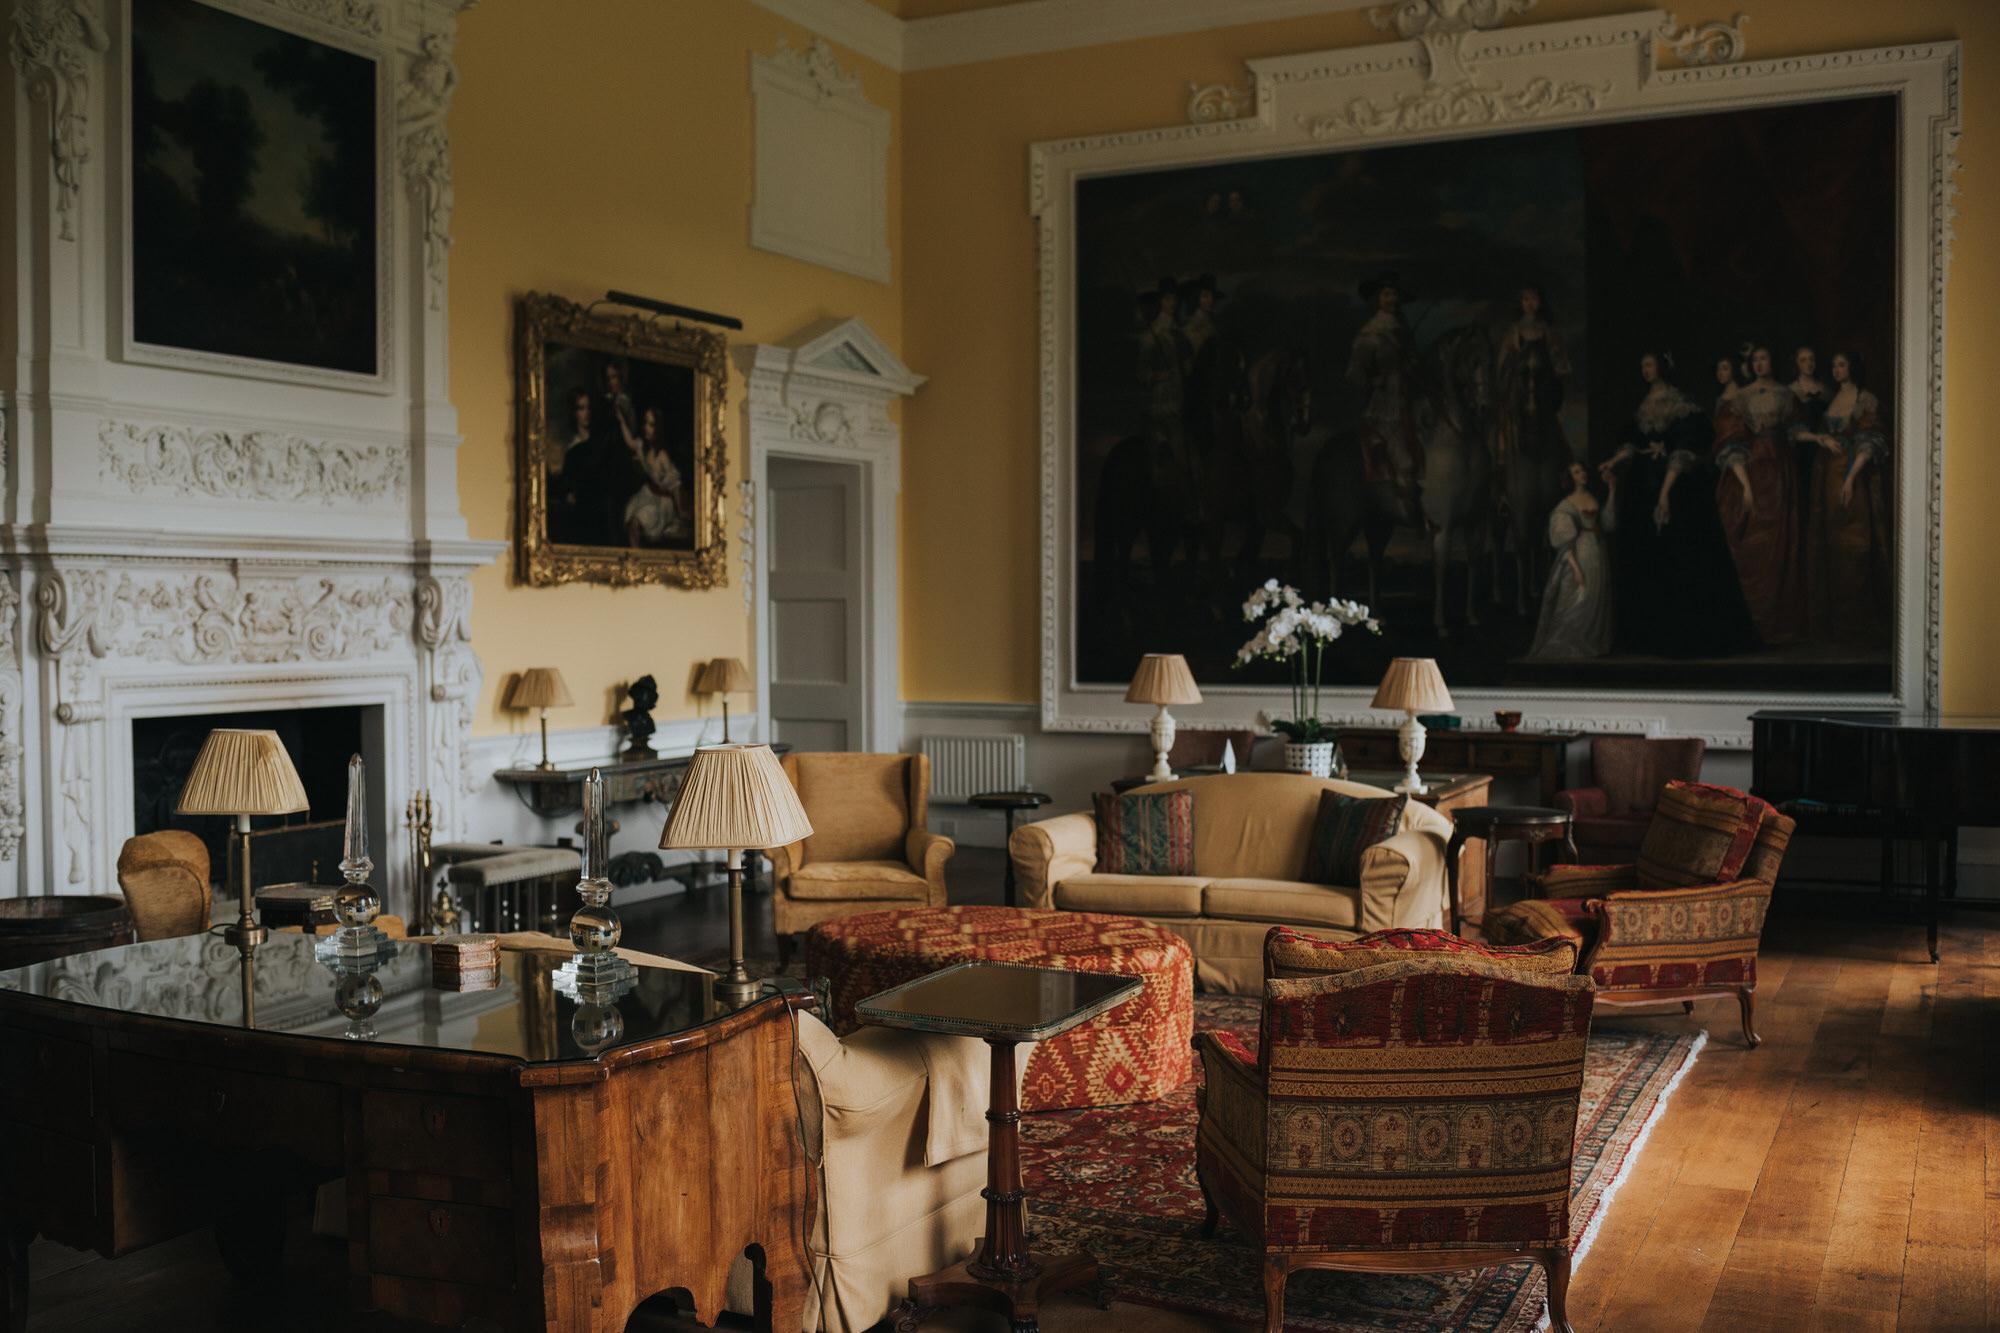 Rooms inside Kirtlington park